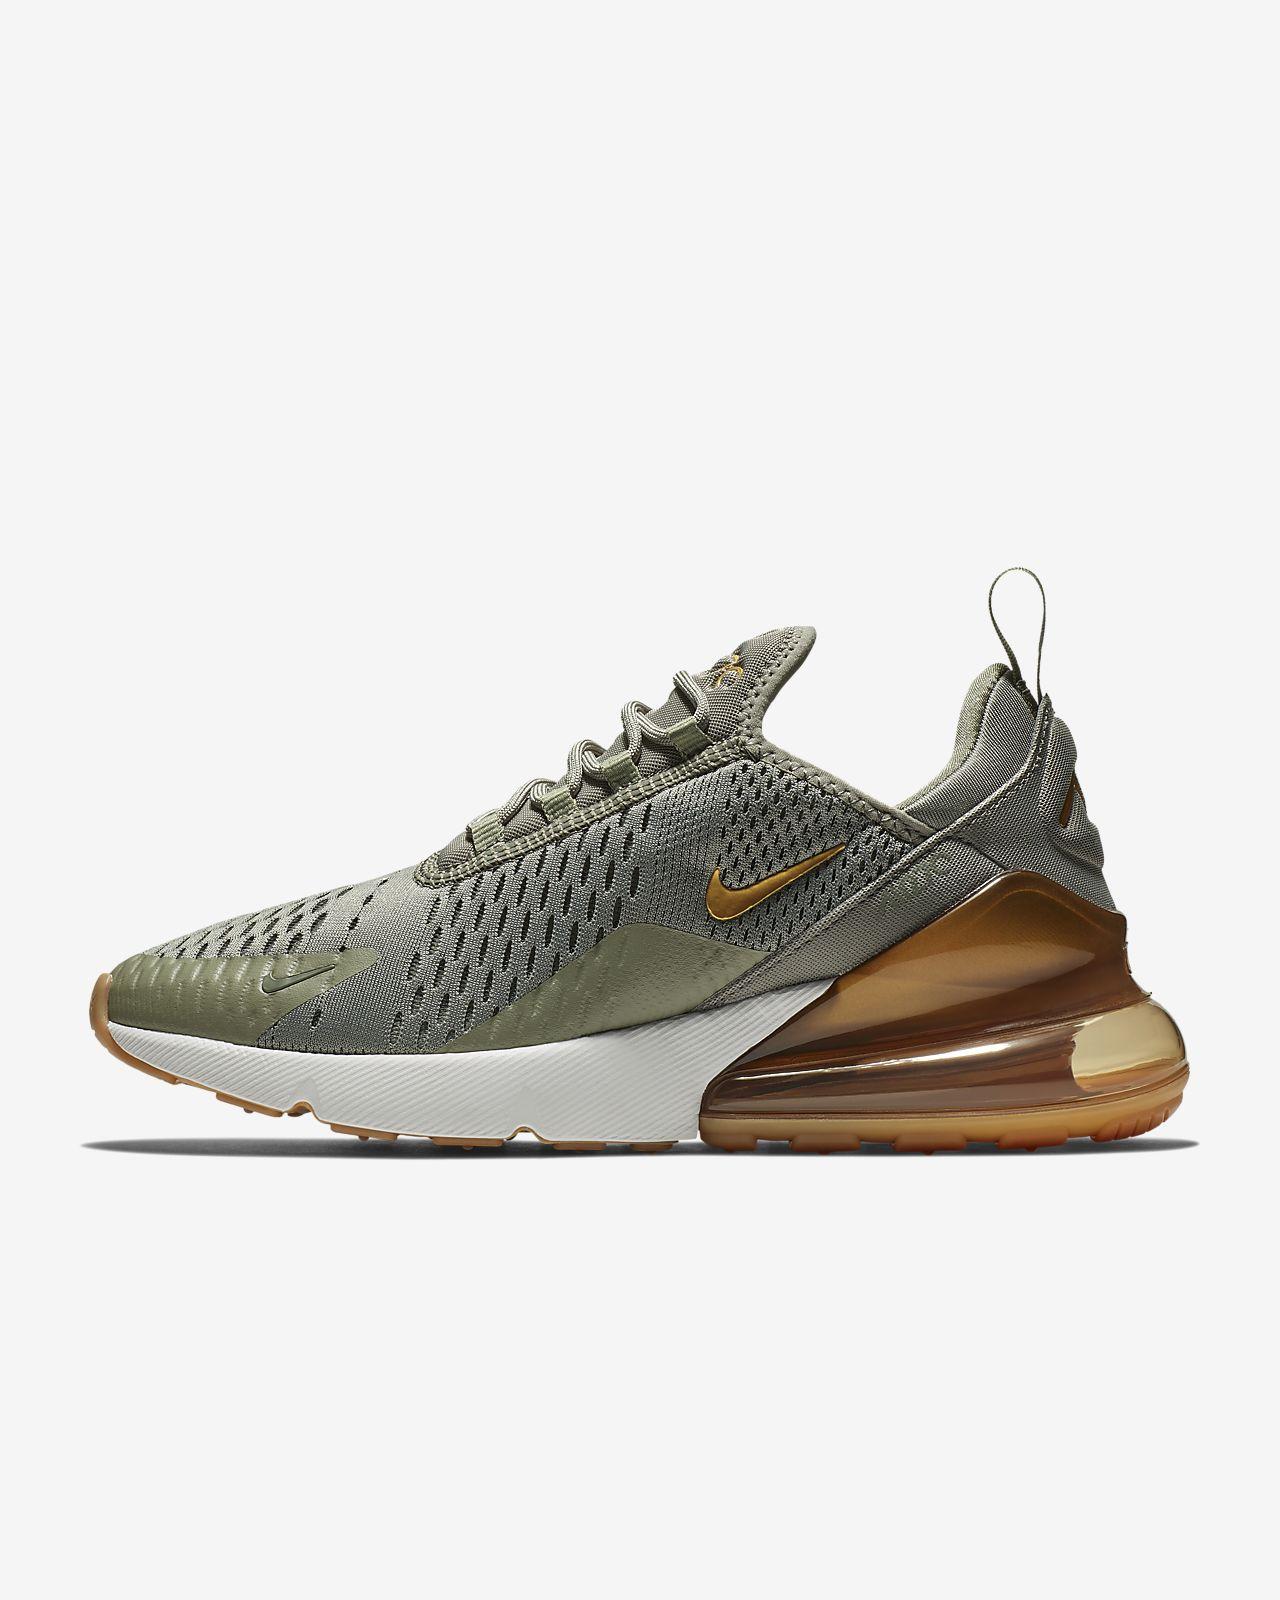 Chaussure Nike Air Max 270 GNO pour Femme